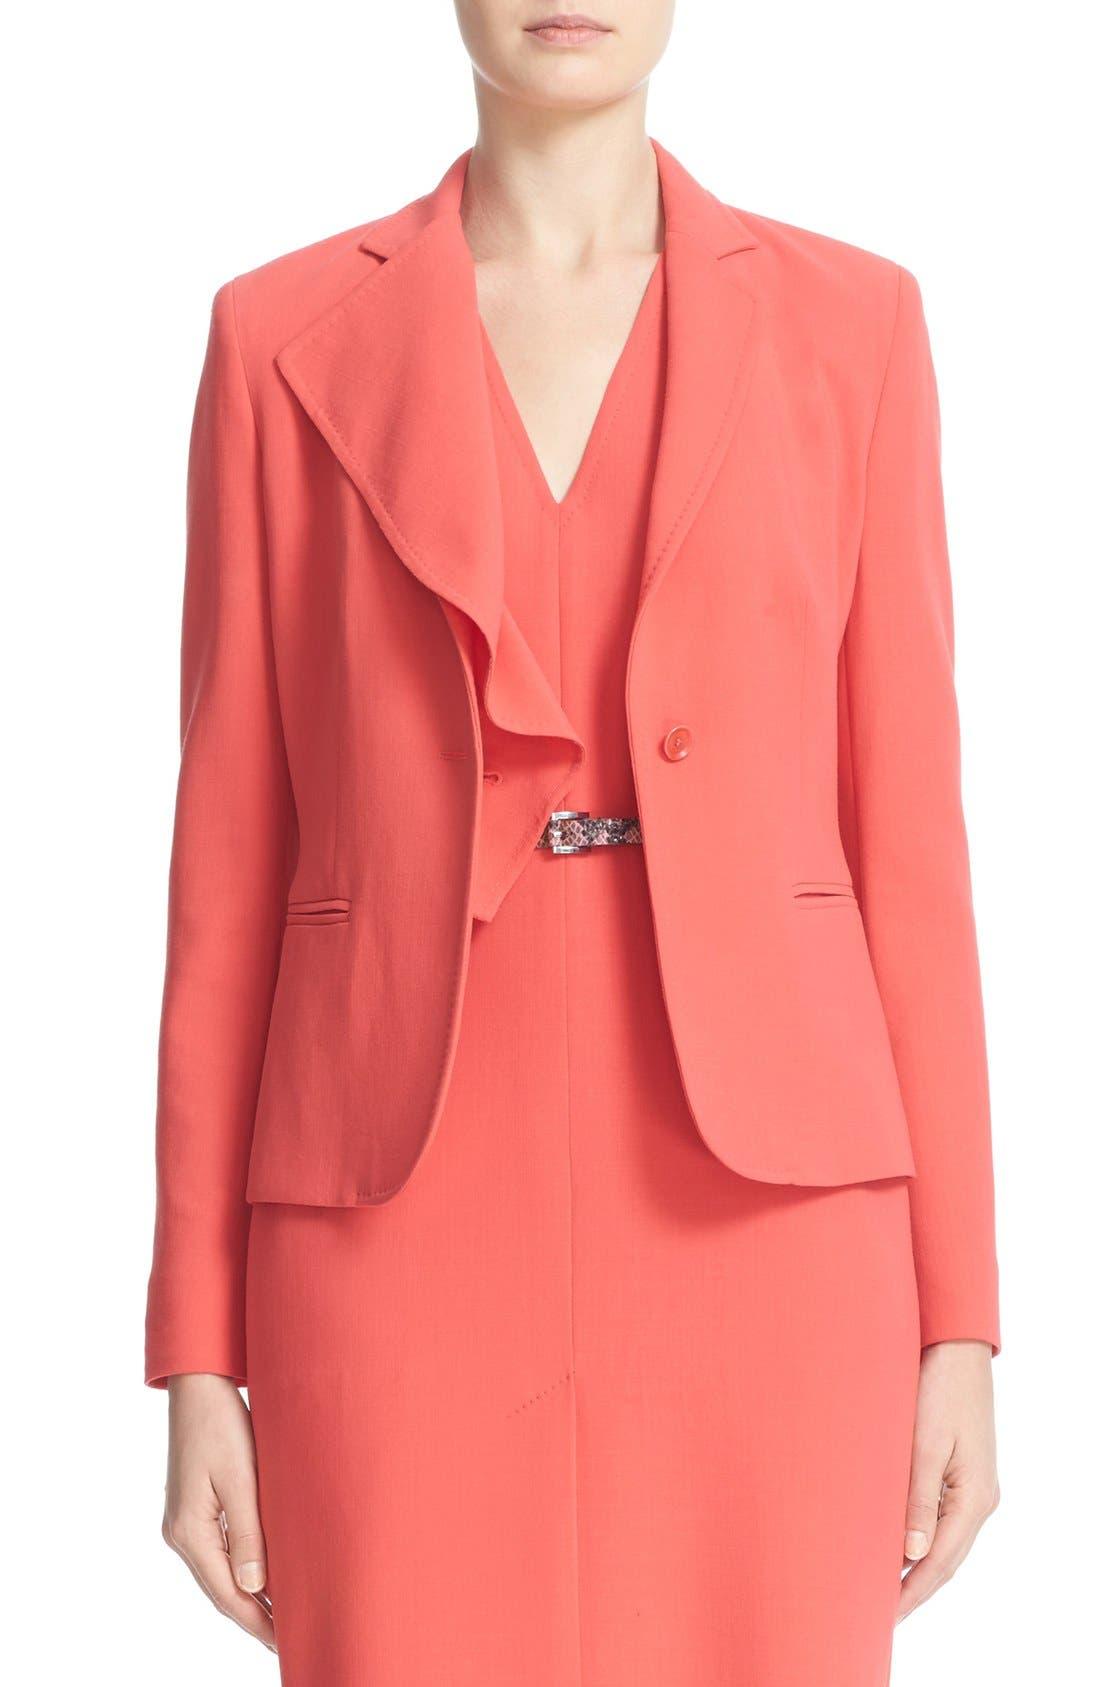 MAX MARA Dardano Wool Crepe Jacket with Removable